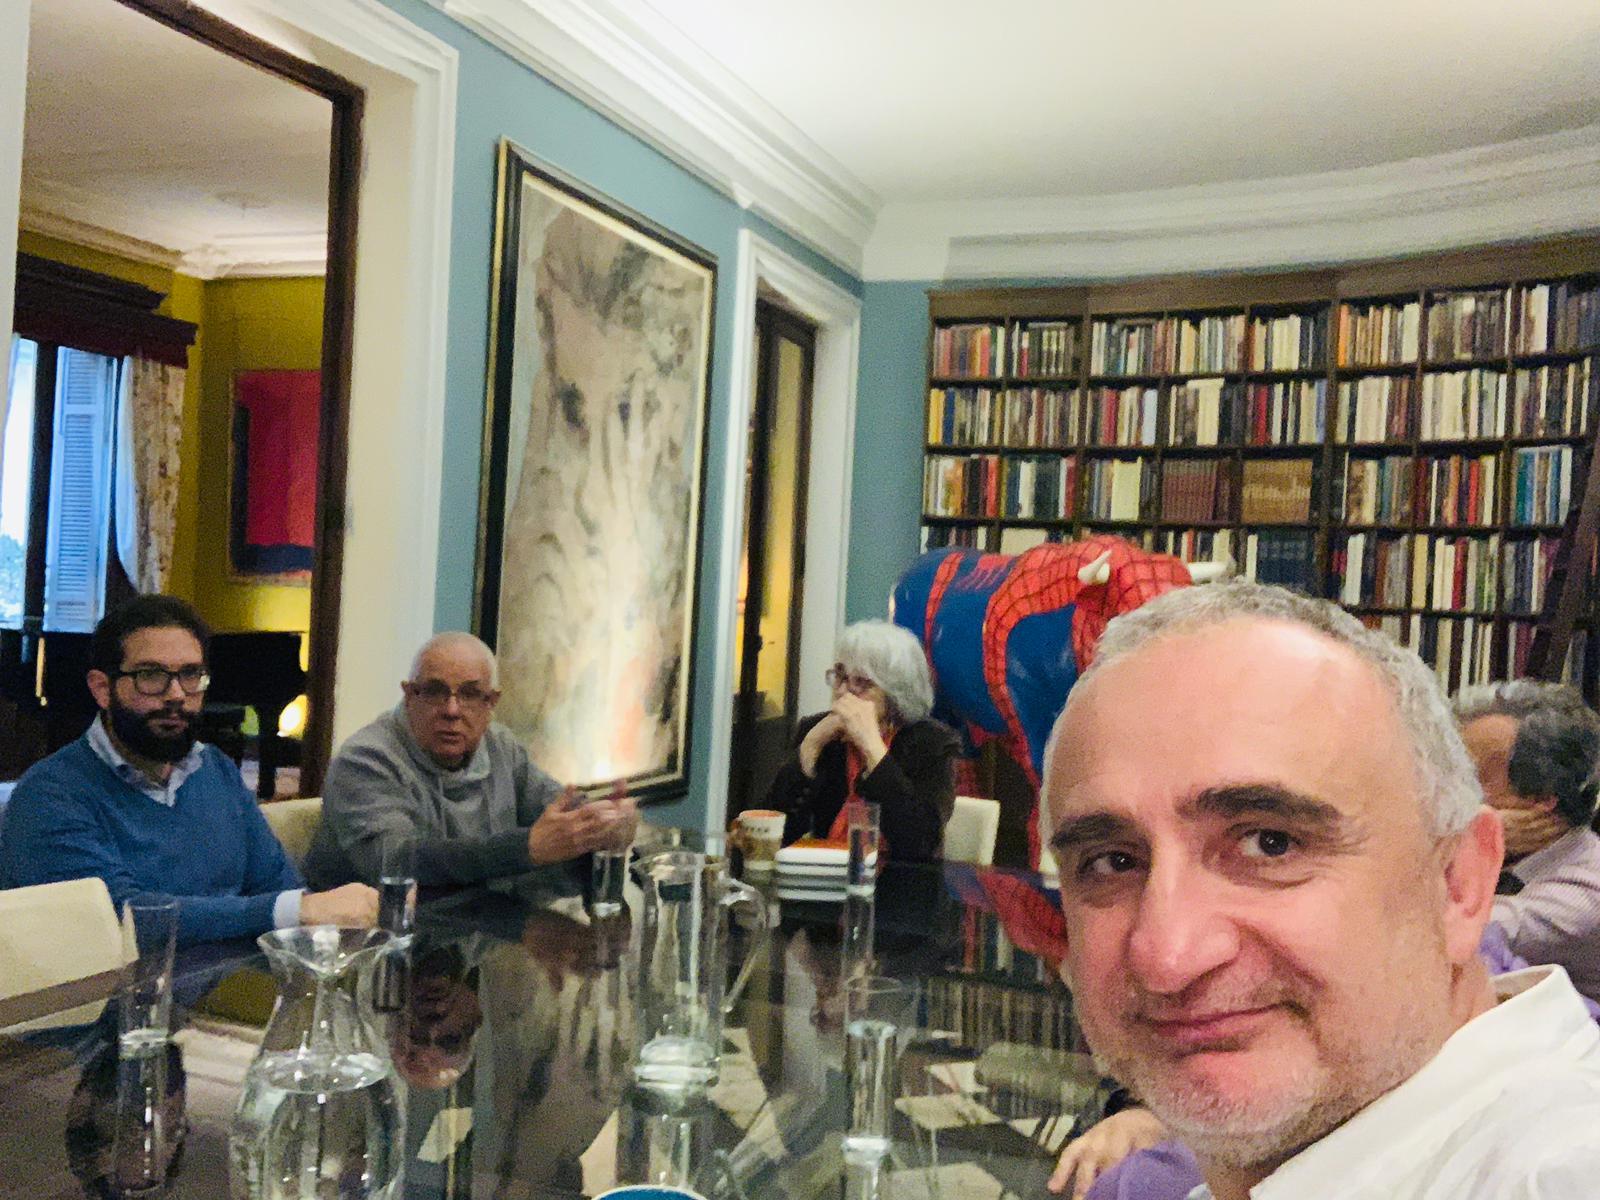 Momento de la reunión informal del Club Nuevo Mundo. Foto: Viktor Gómez.